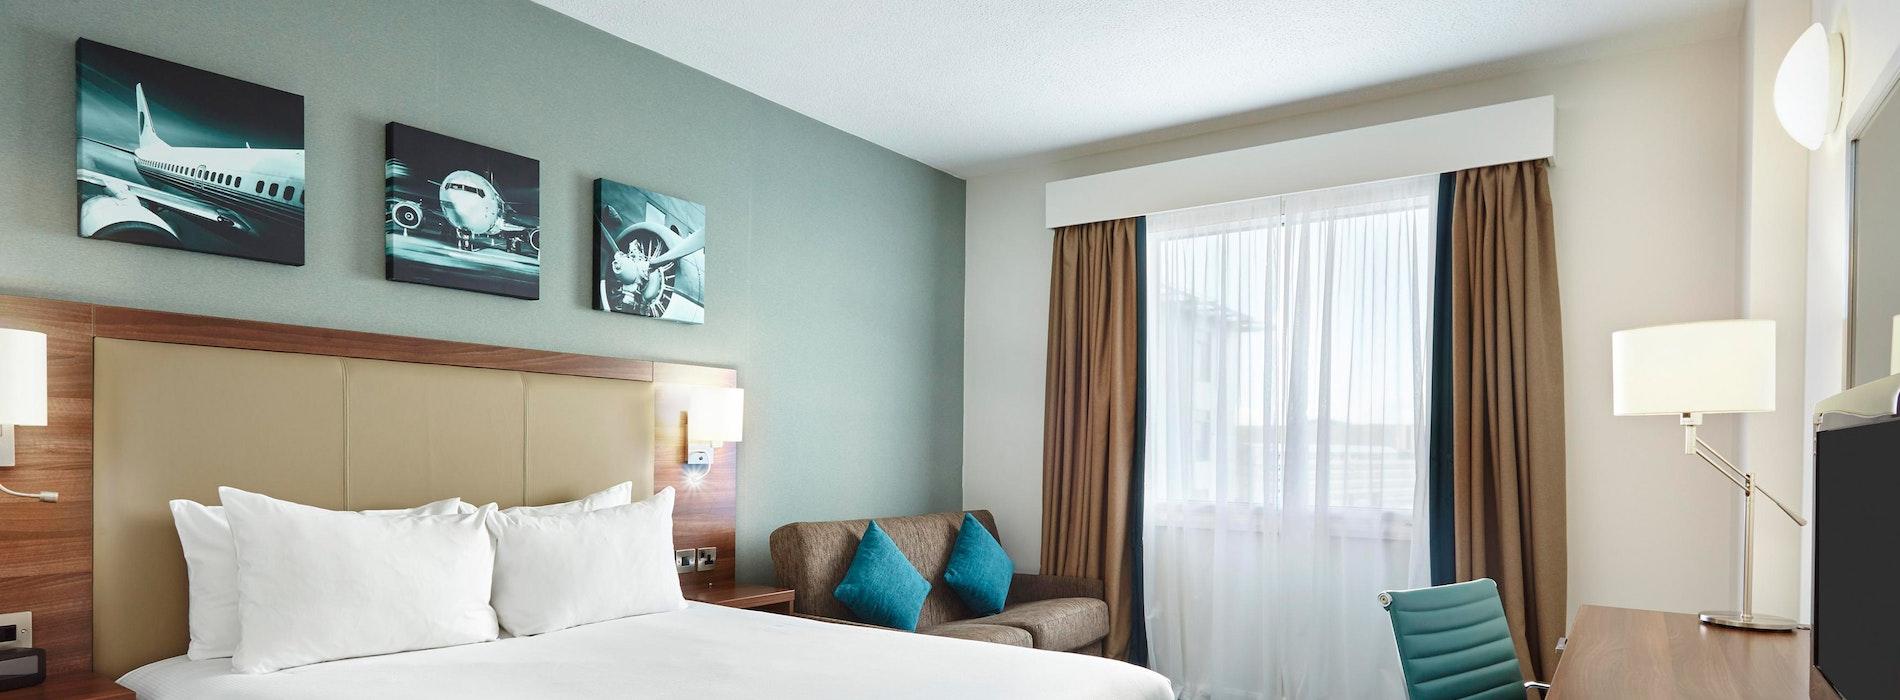 Hilton Garden Inn Heathrow near LEGOLAND Windsor Resort